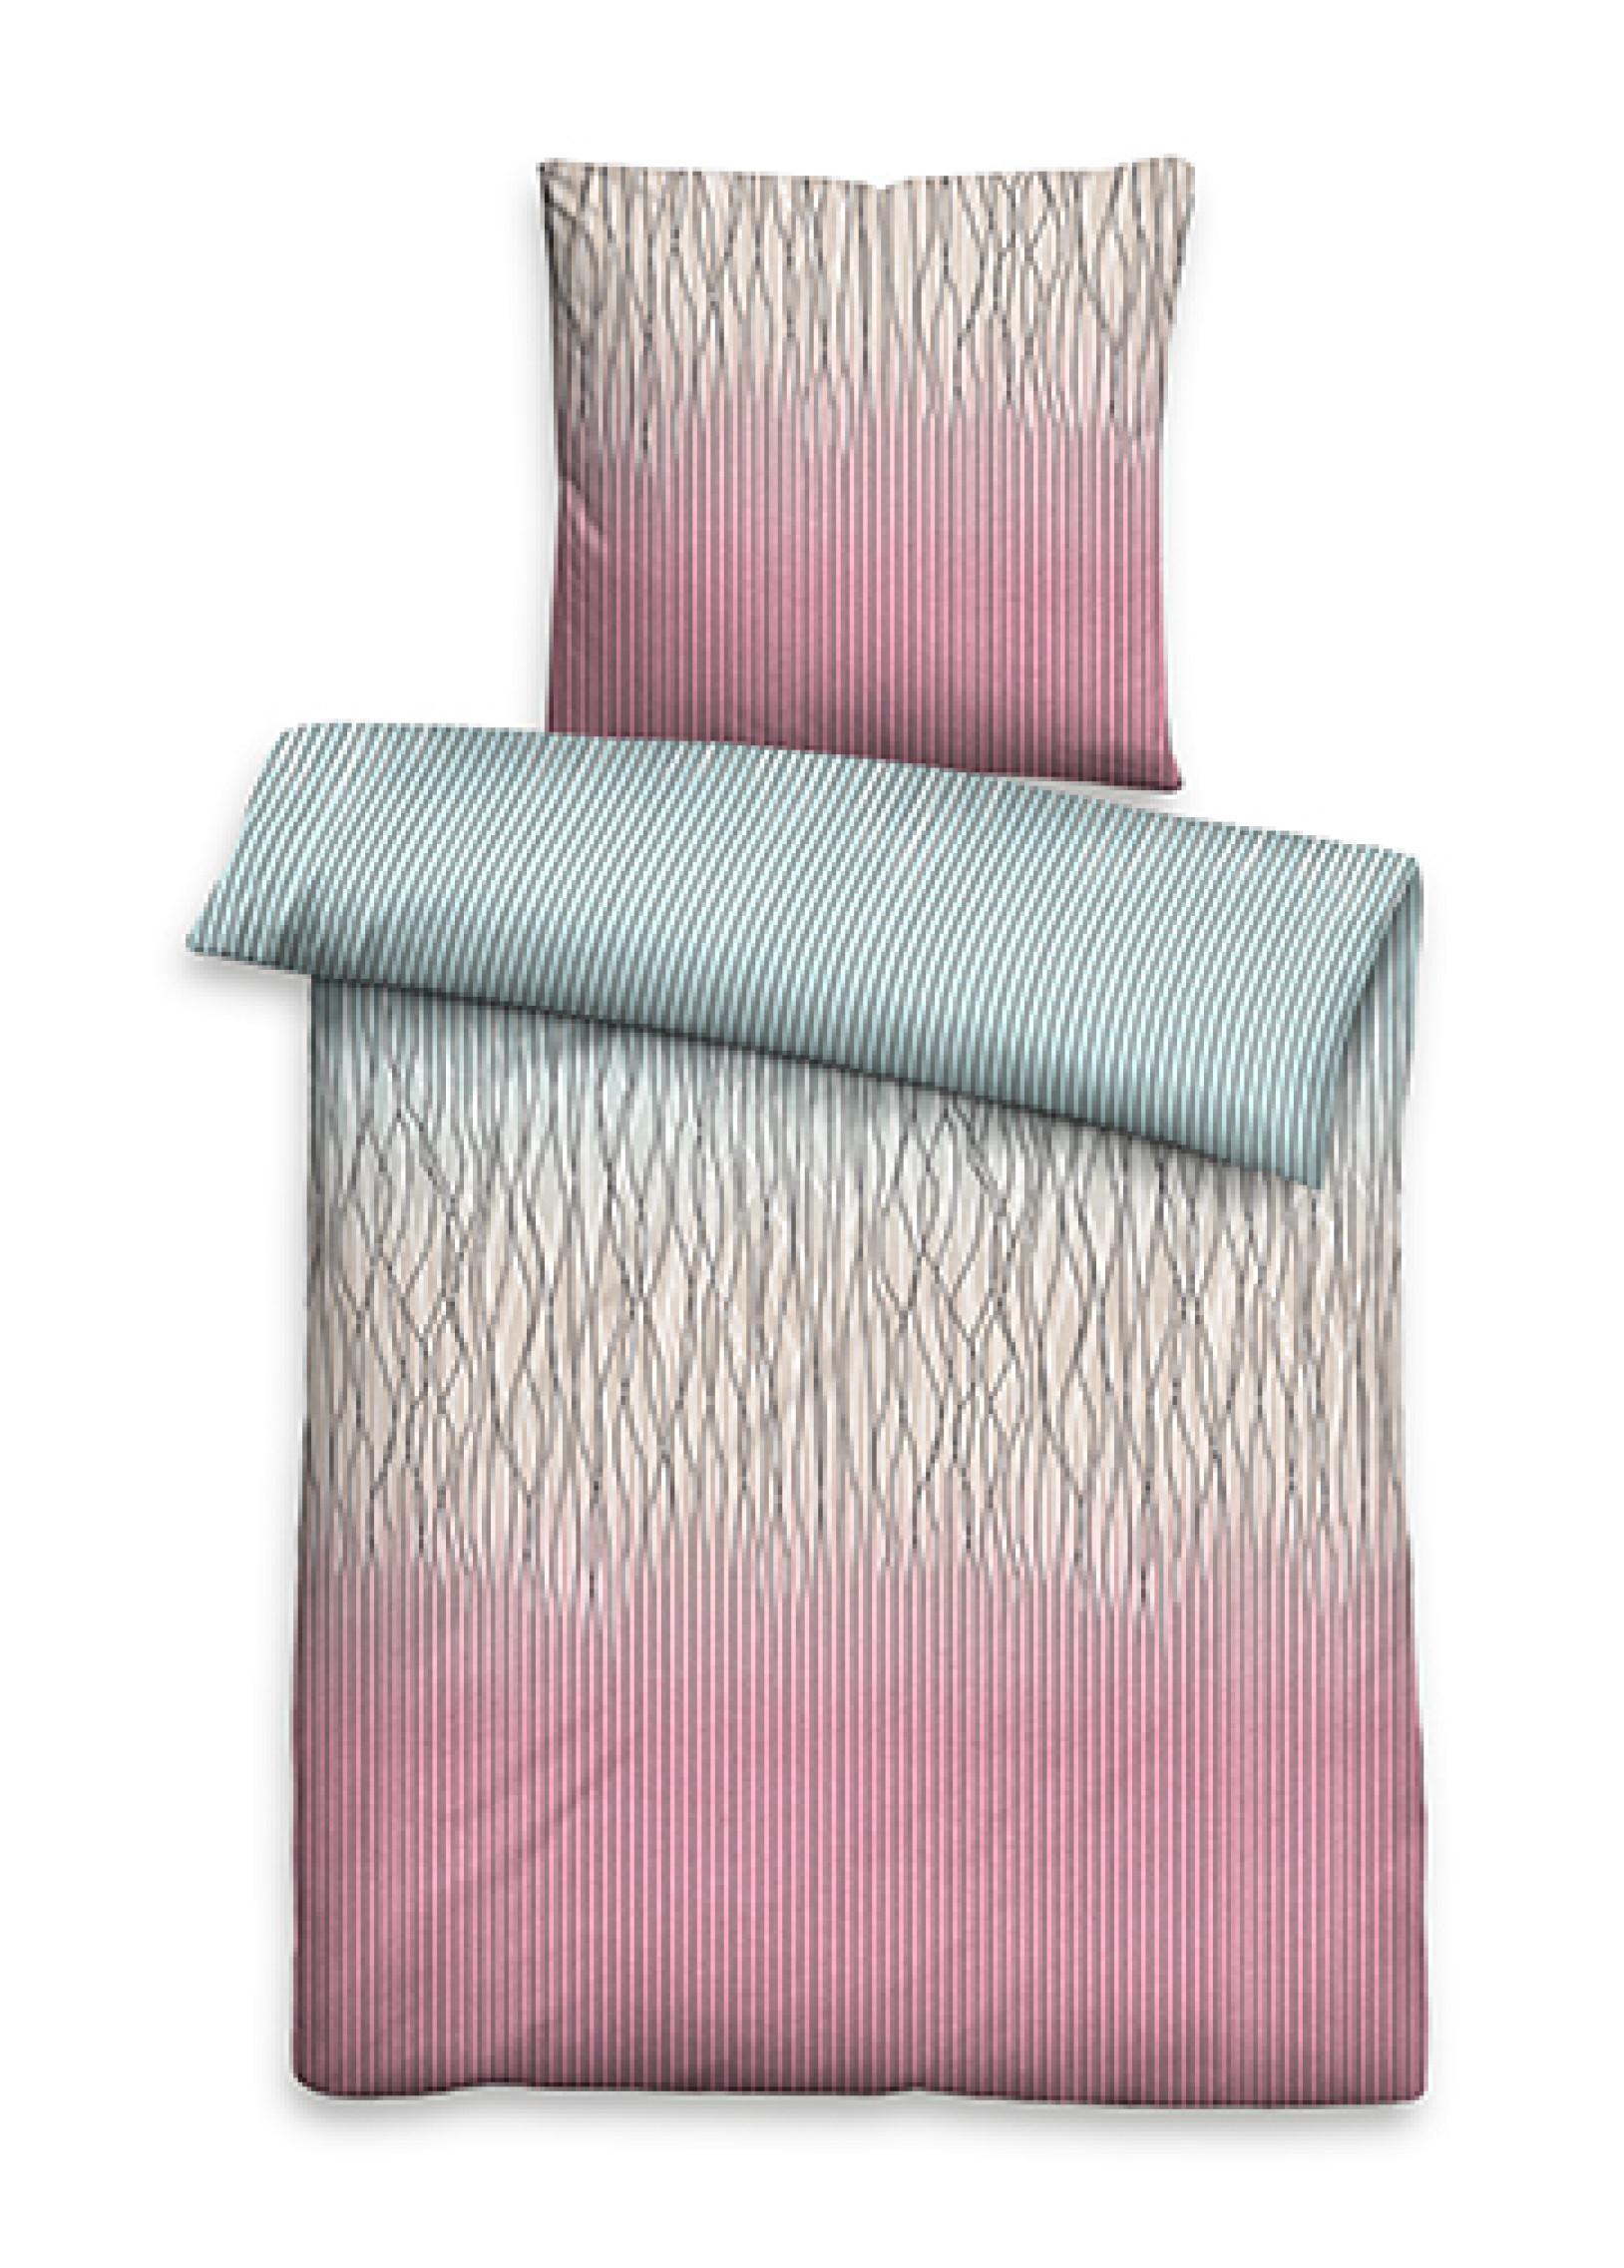 Baumwollsatin Bettw/äsche Susan Zartes Rosa 155 x 220 cm 1 Kissenbezug 1x 80 x 80 cm 1 Bettbezug